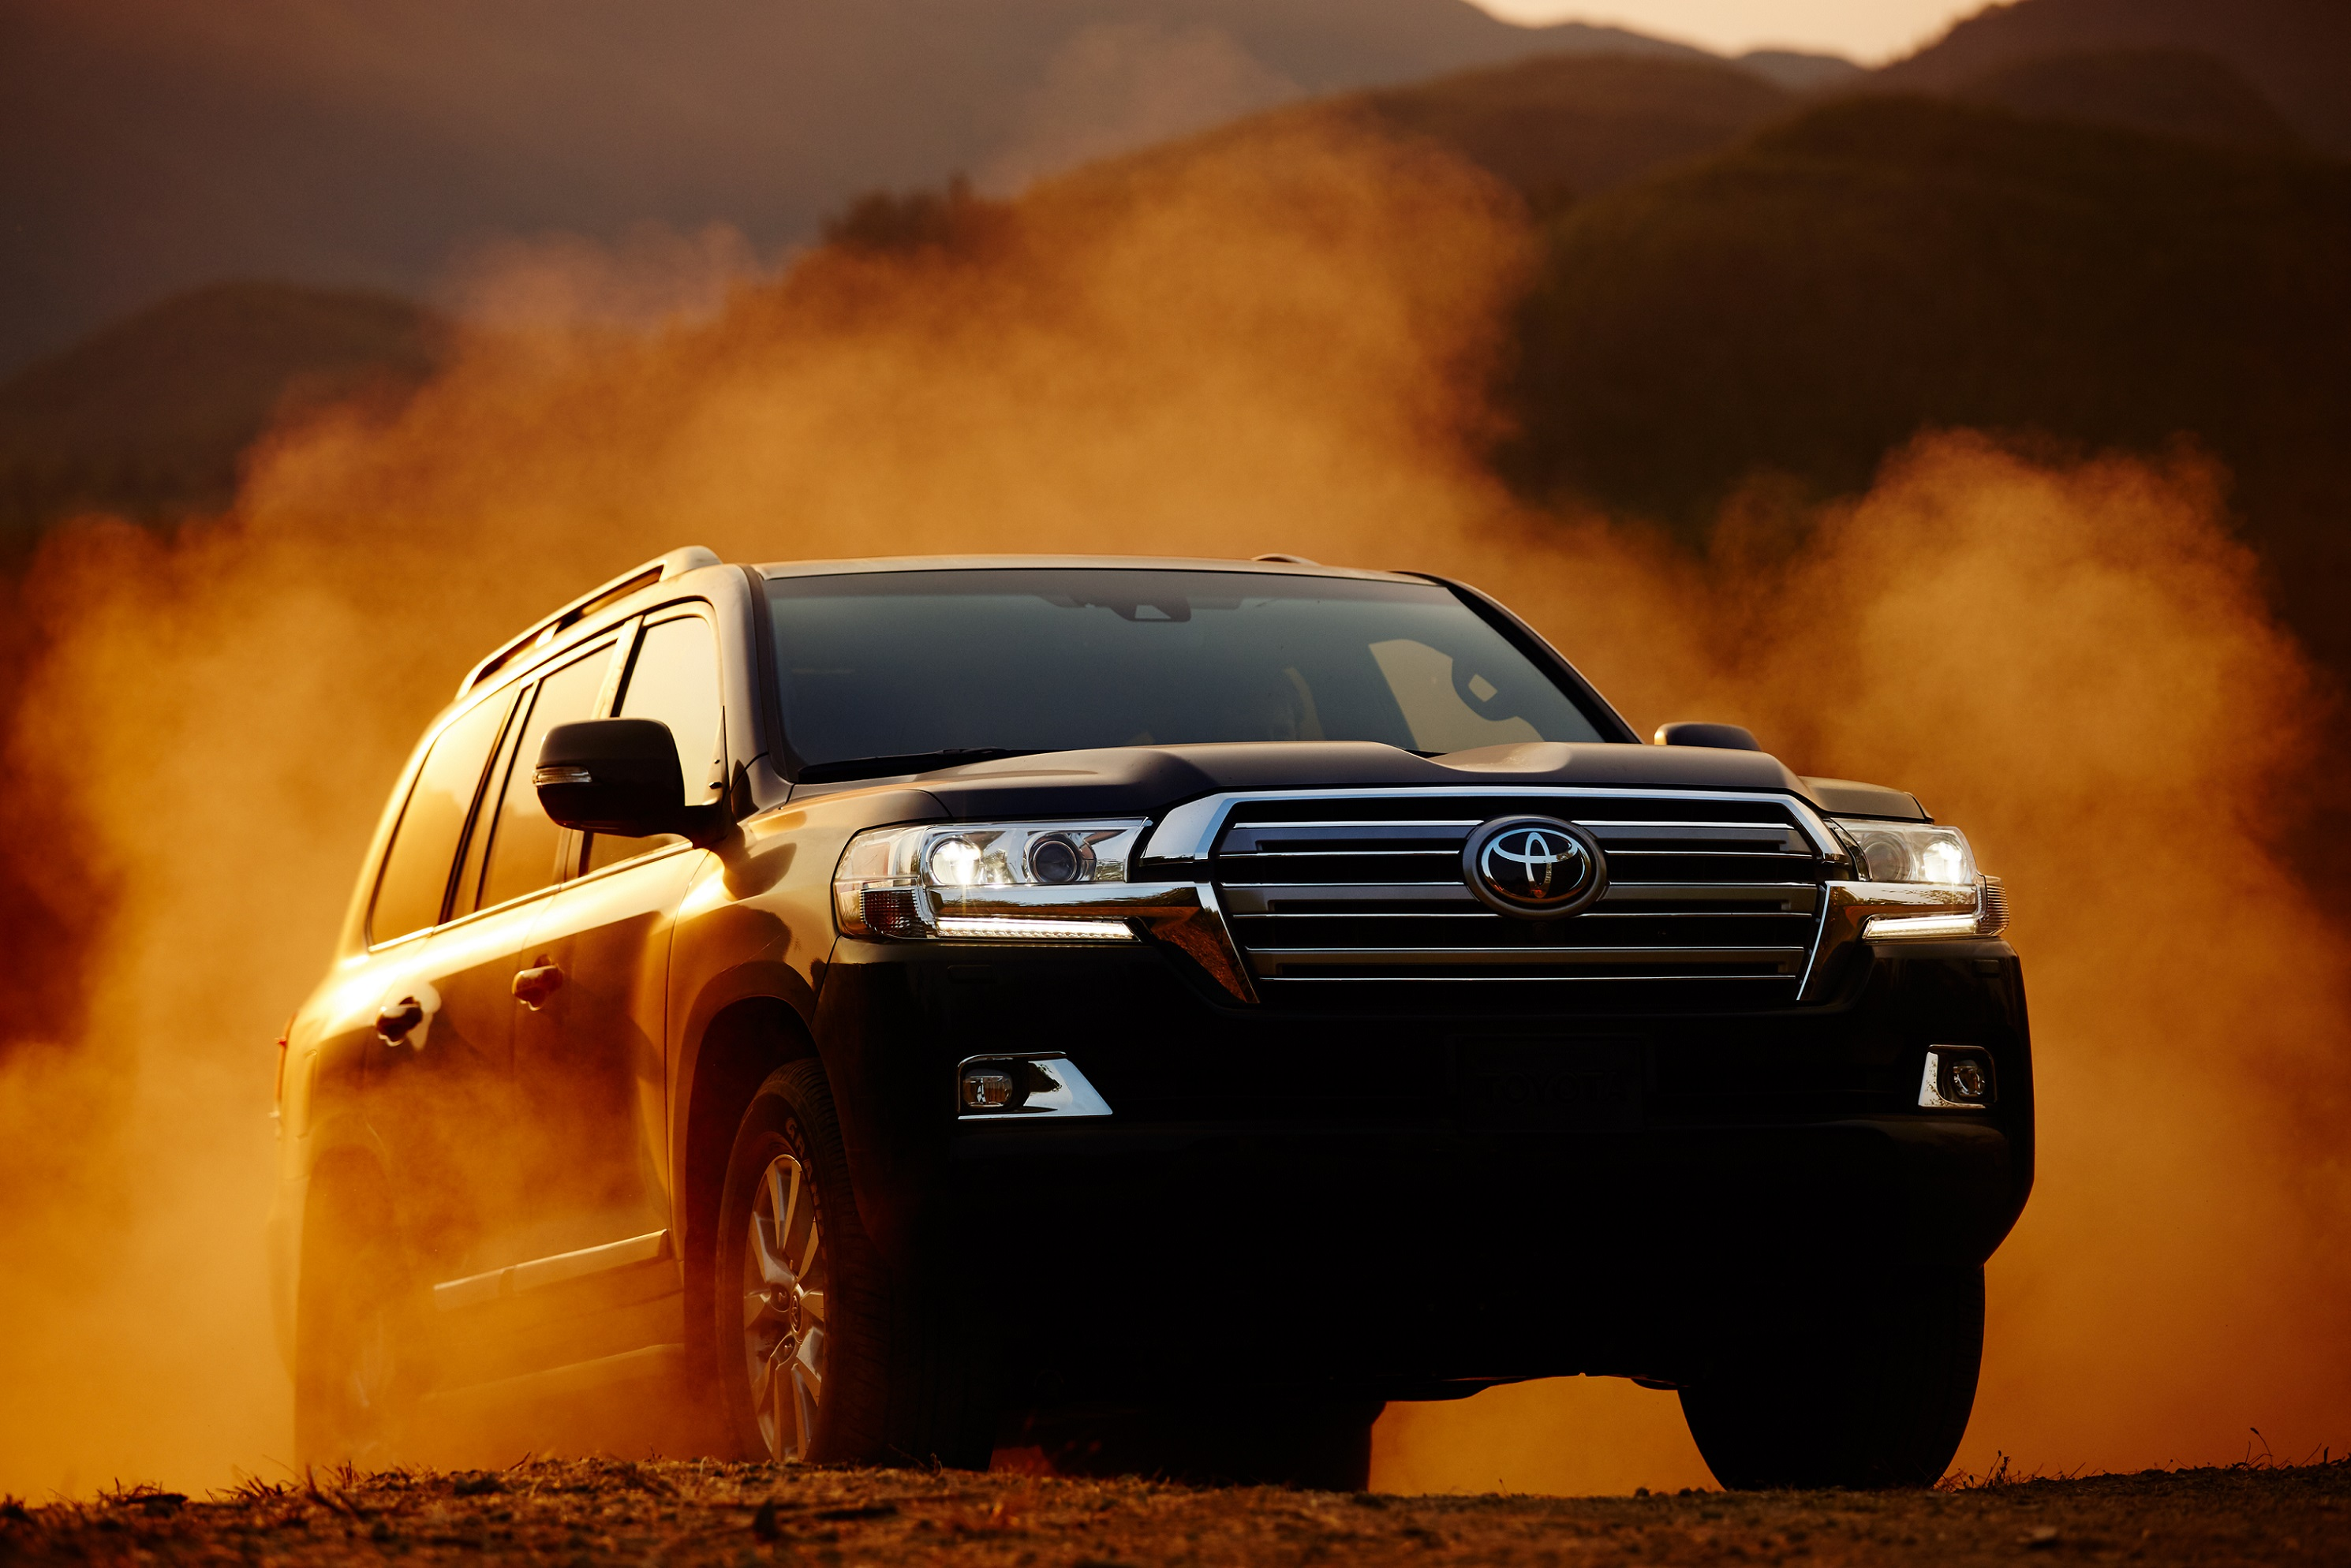 Toyota Land Cruiser Series Global Sales Pass 10 Million Mark